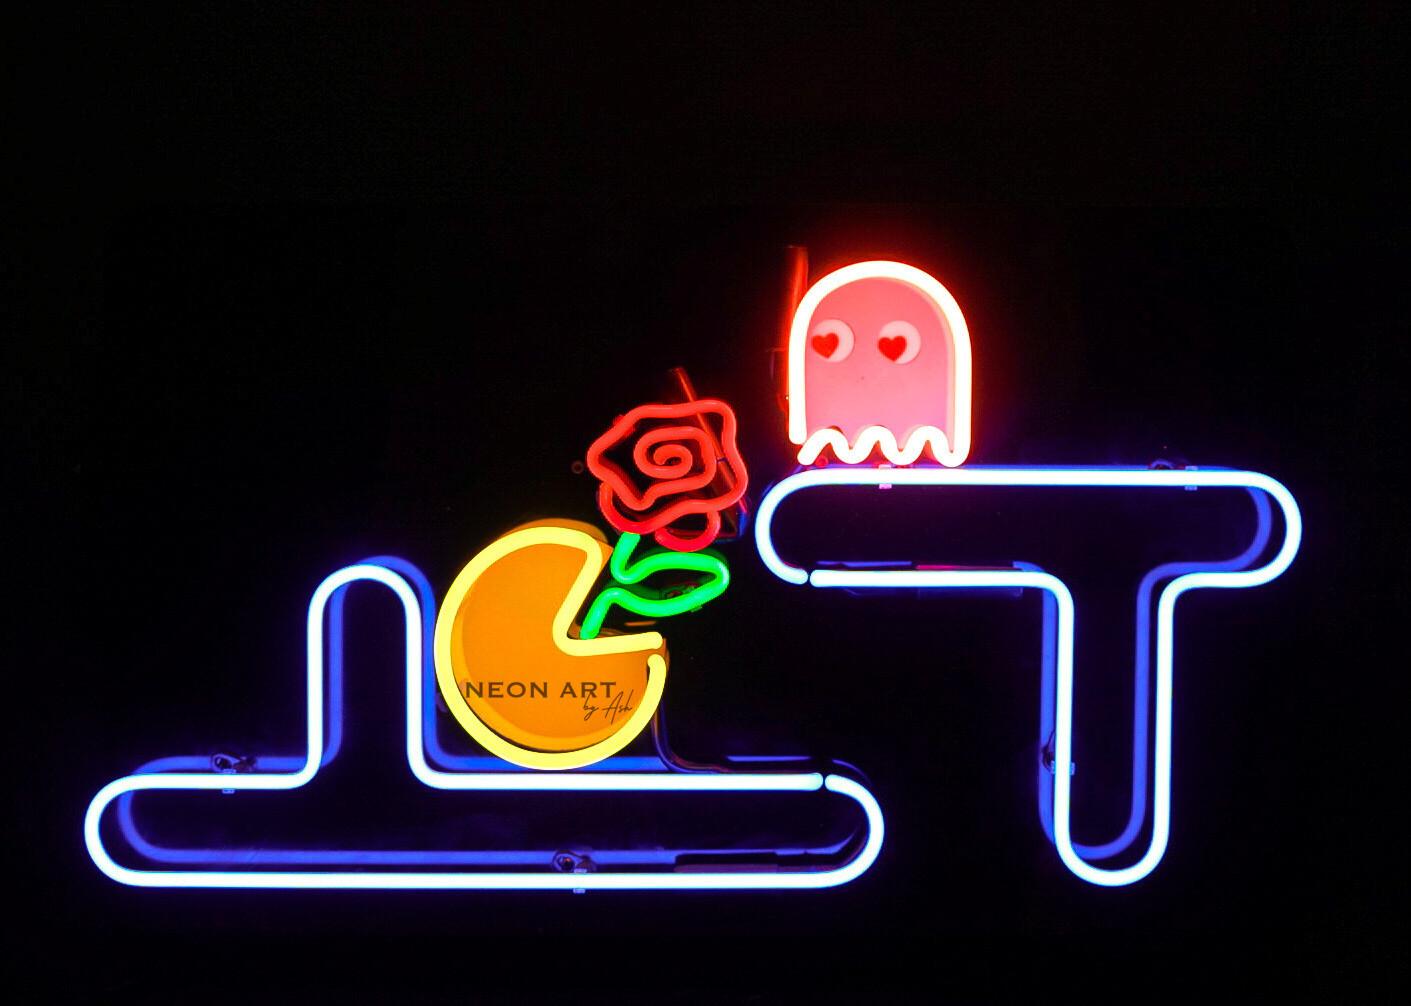 PAC-MAN Neon Artwork   Neon Light Sign